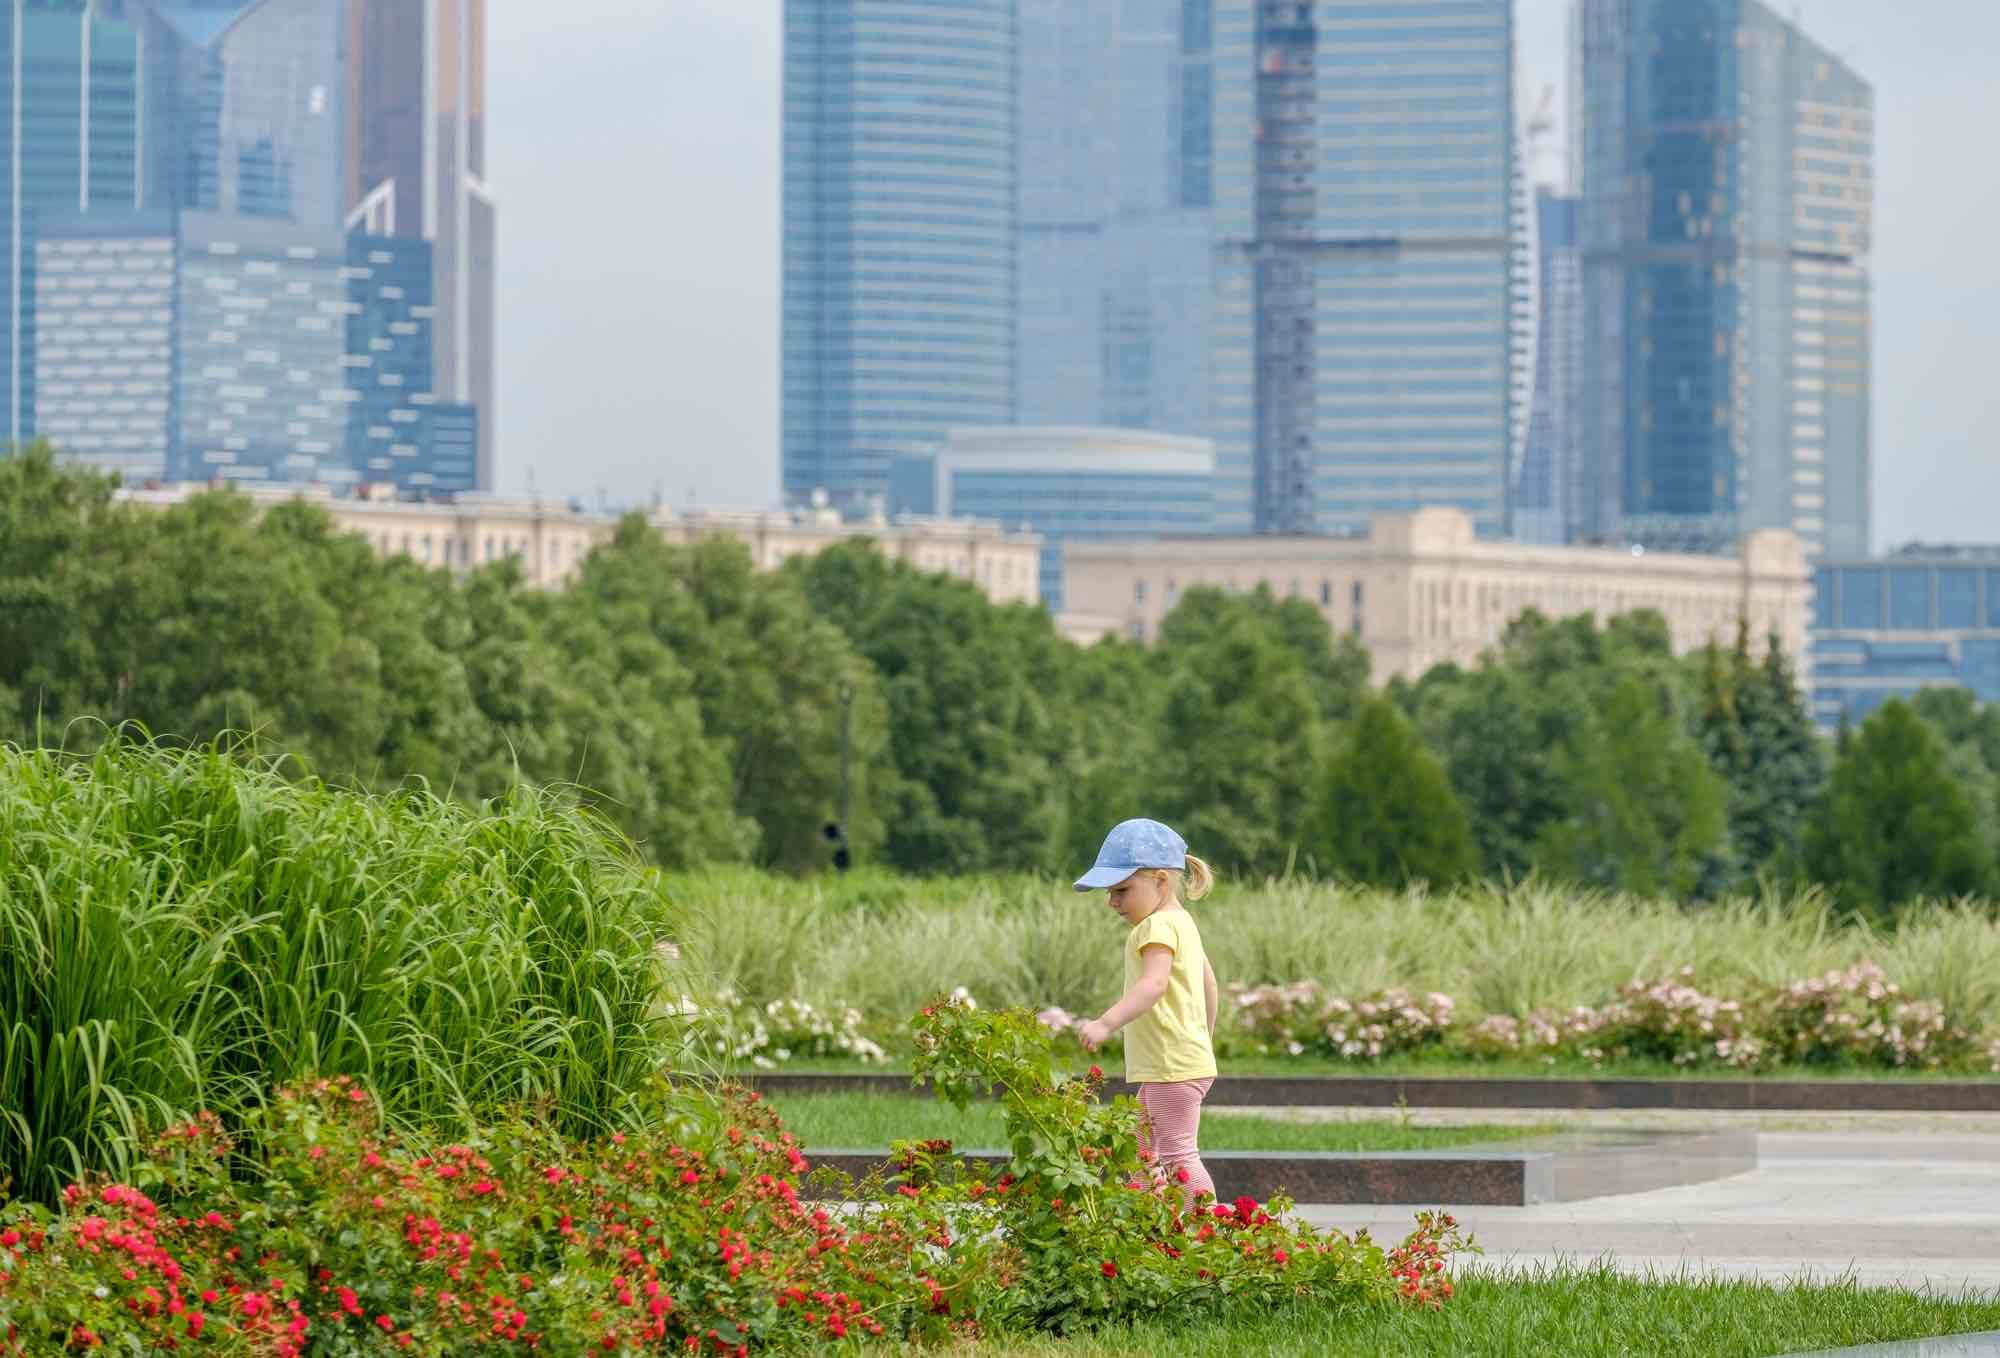 Nina-parque-urbano